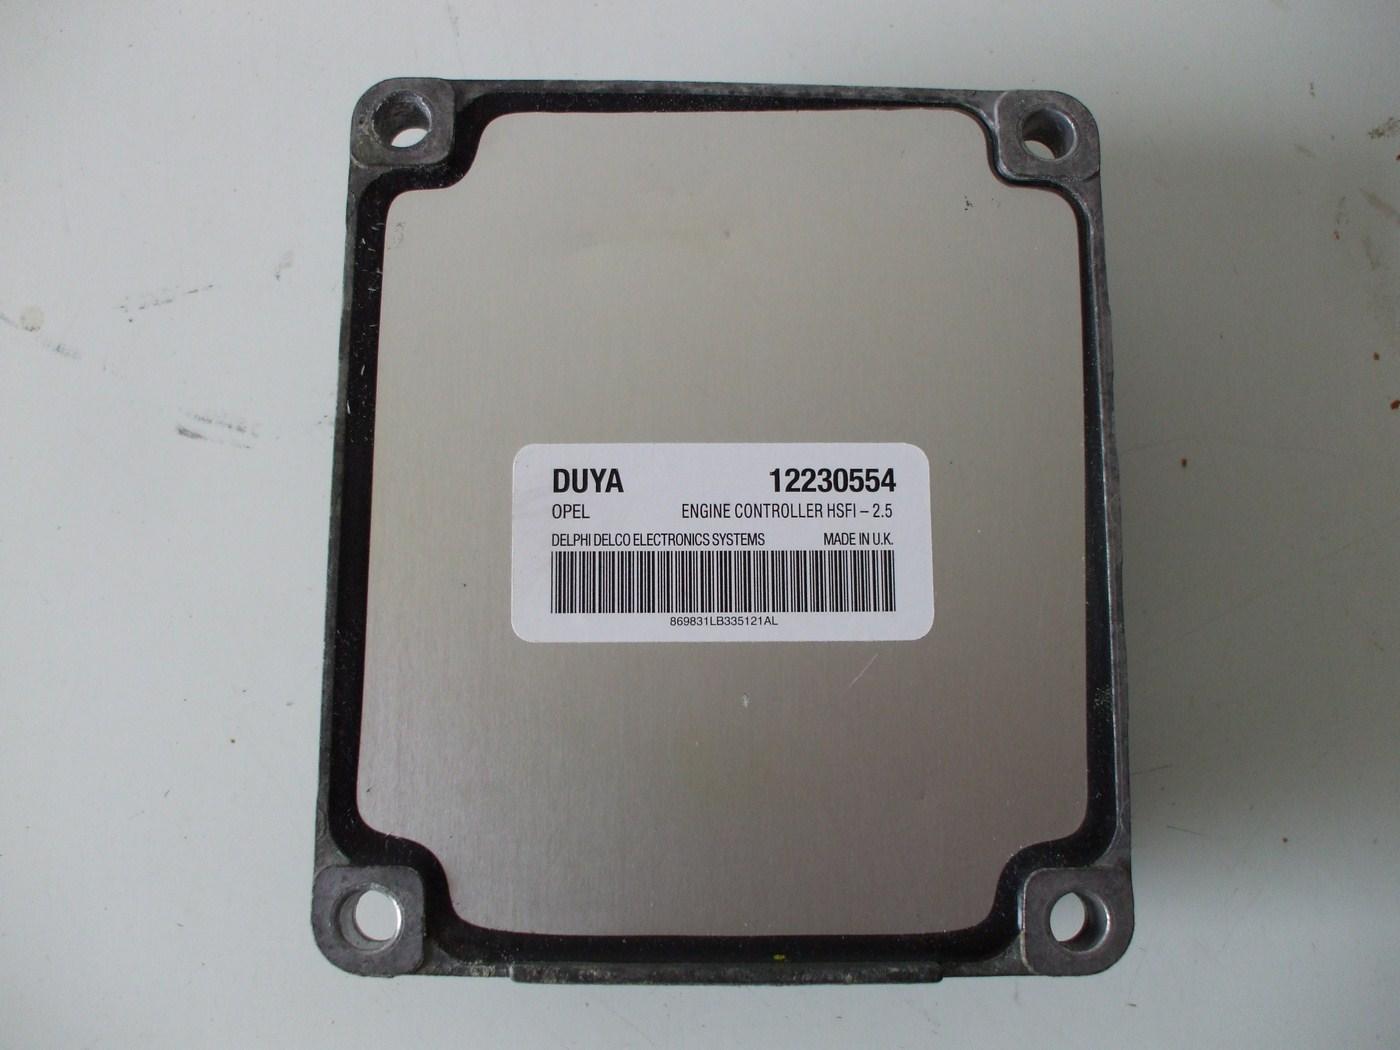 opel meriva 1 6 16v компьютер 12230554 duya wylogow